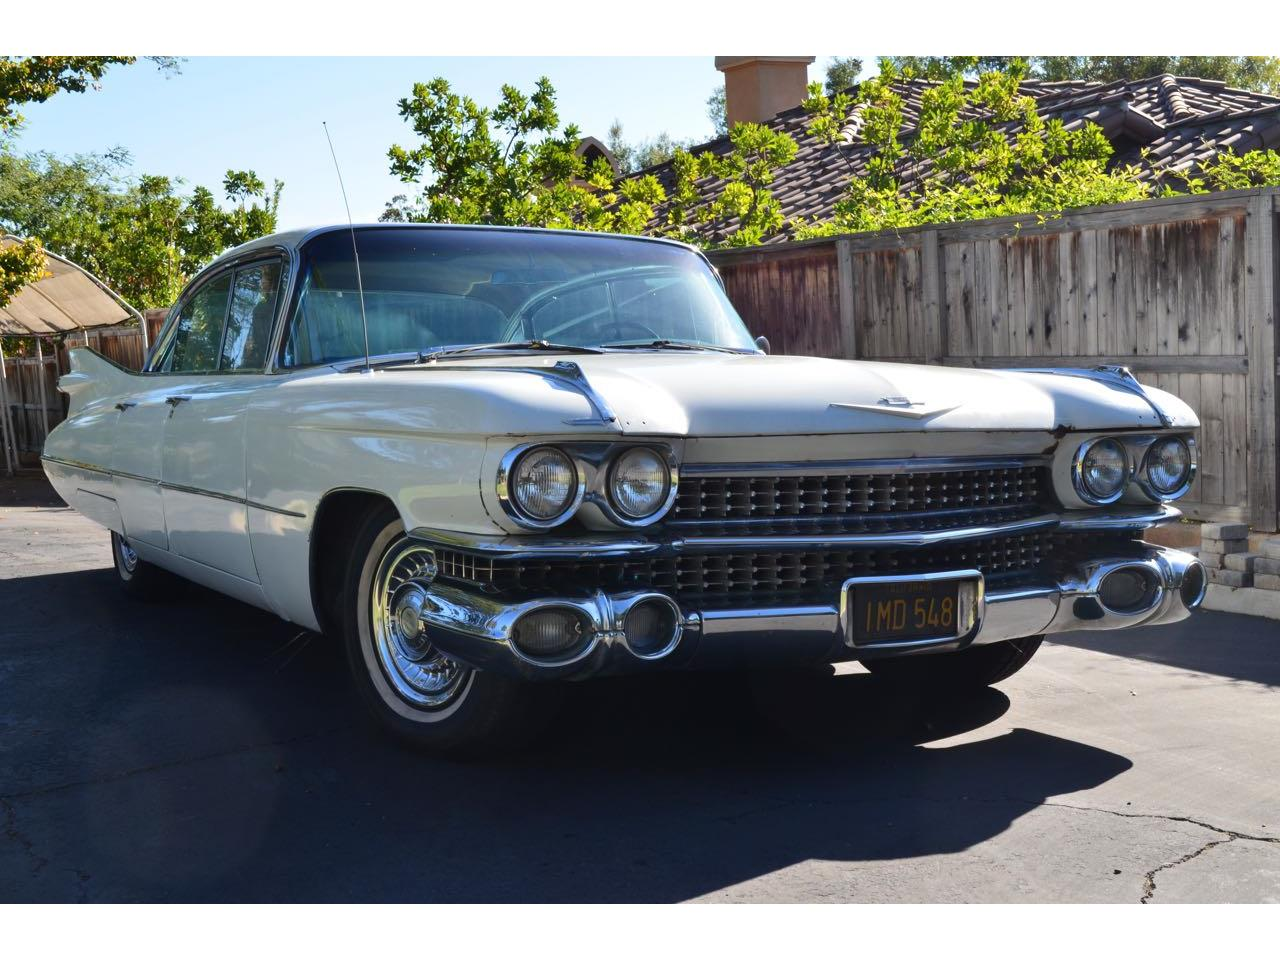 1959 Cadillac Sedan Deville For Sale Classiccars Com Cc 937688